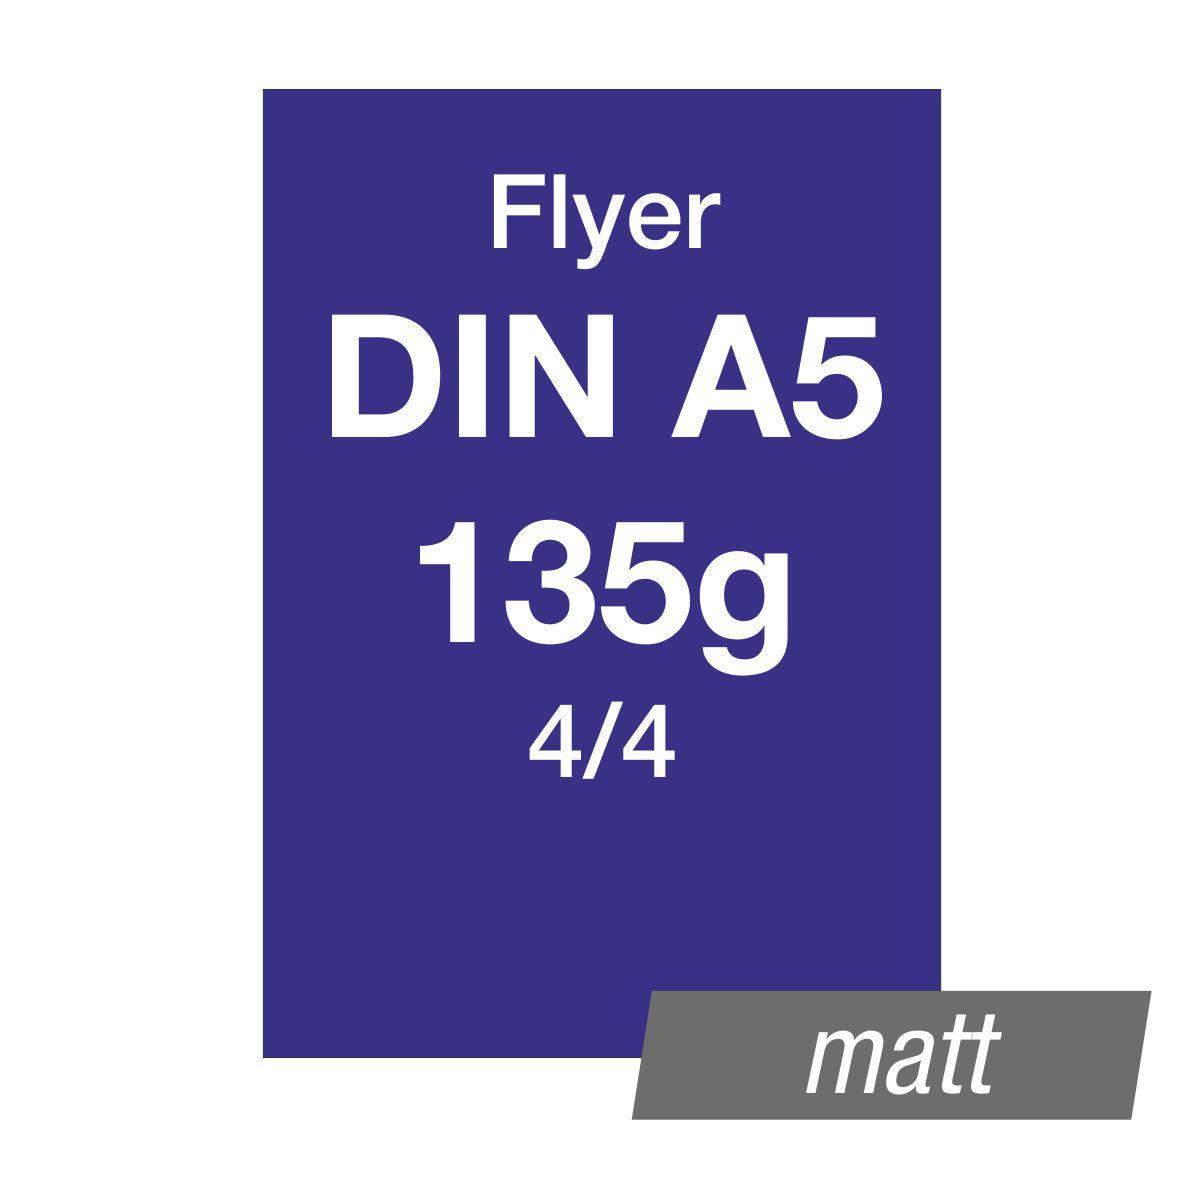 Flyer DIN A5 135g 4/4